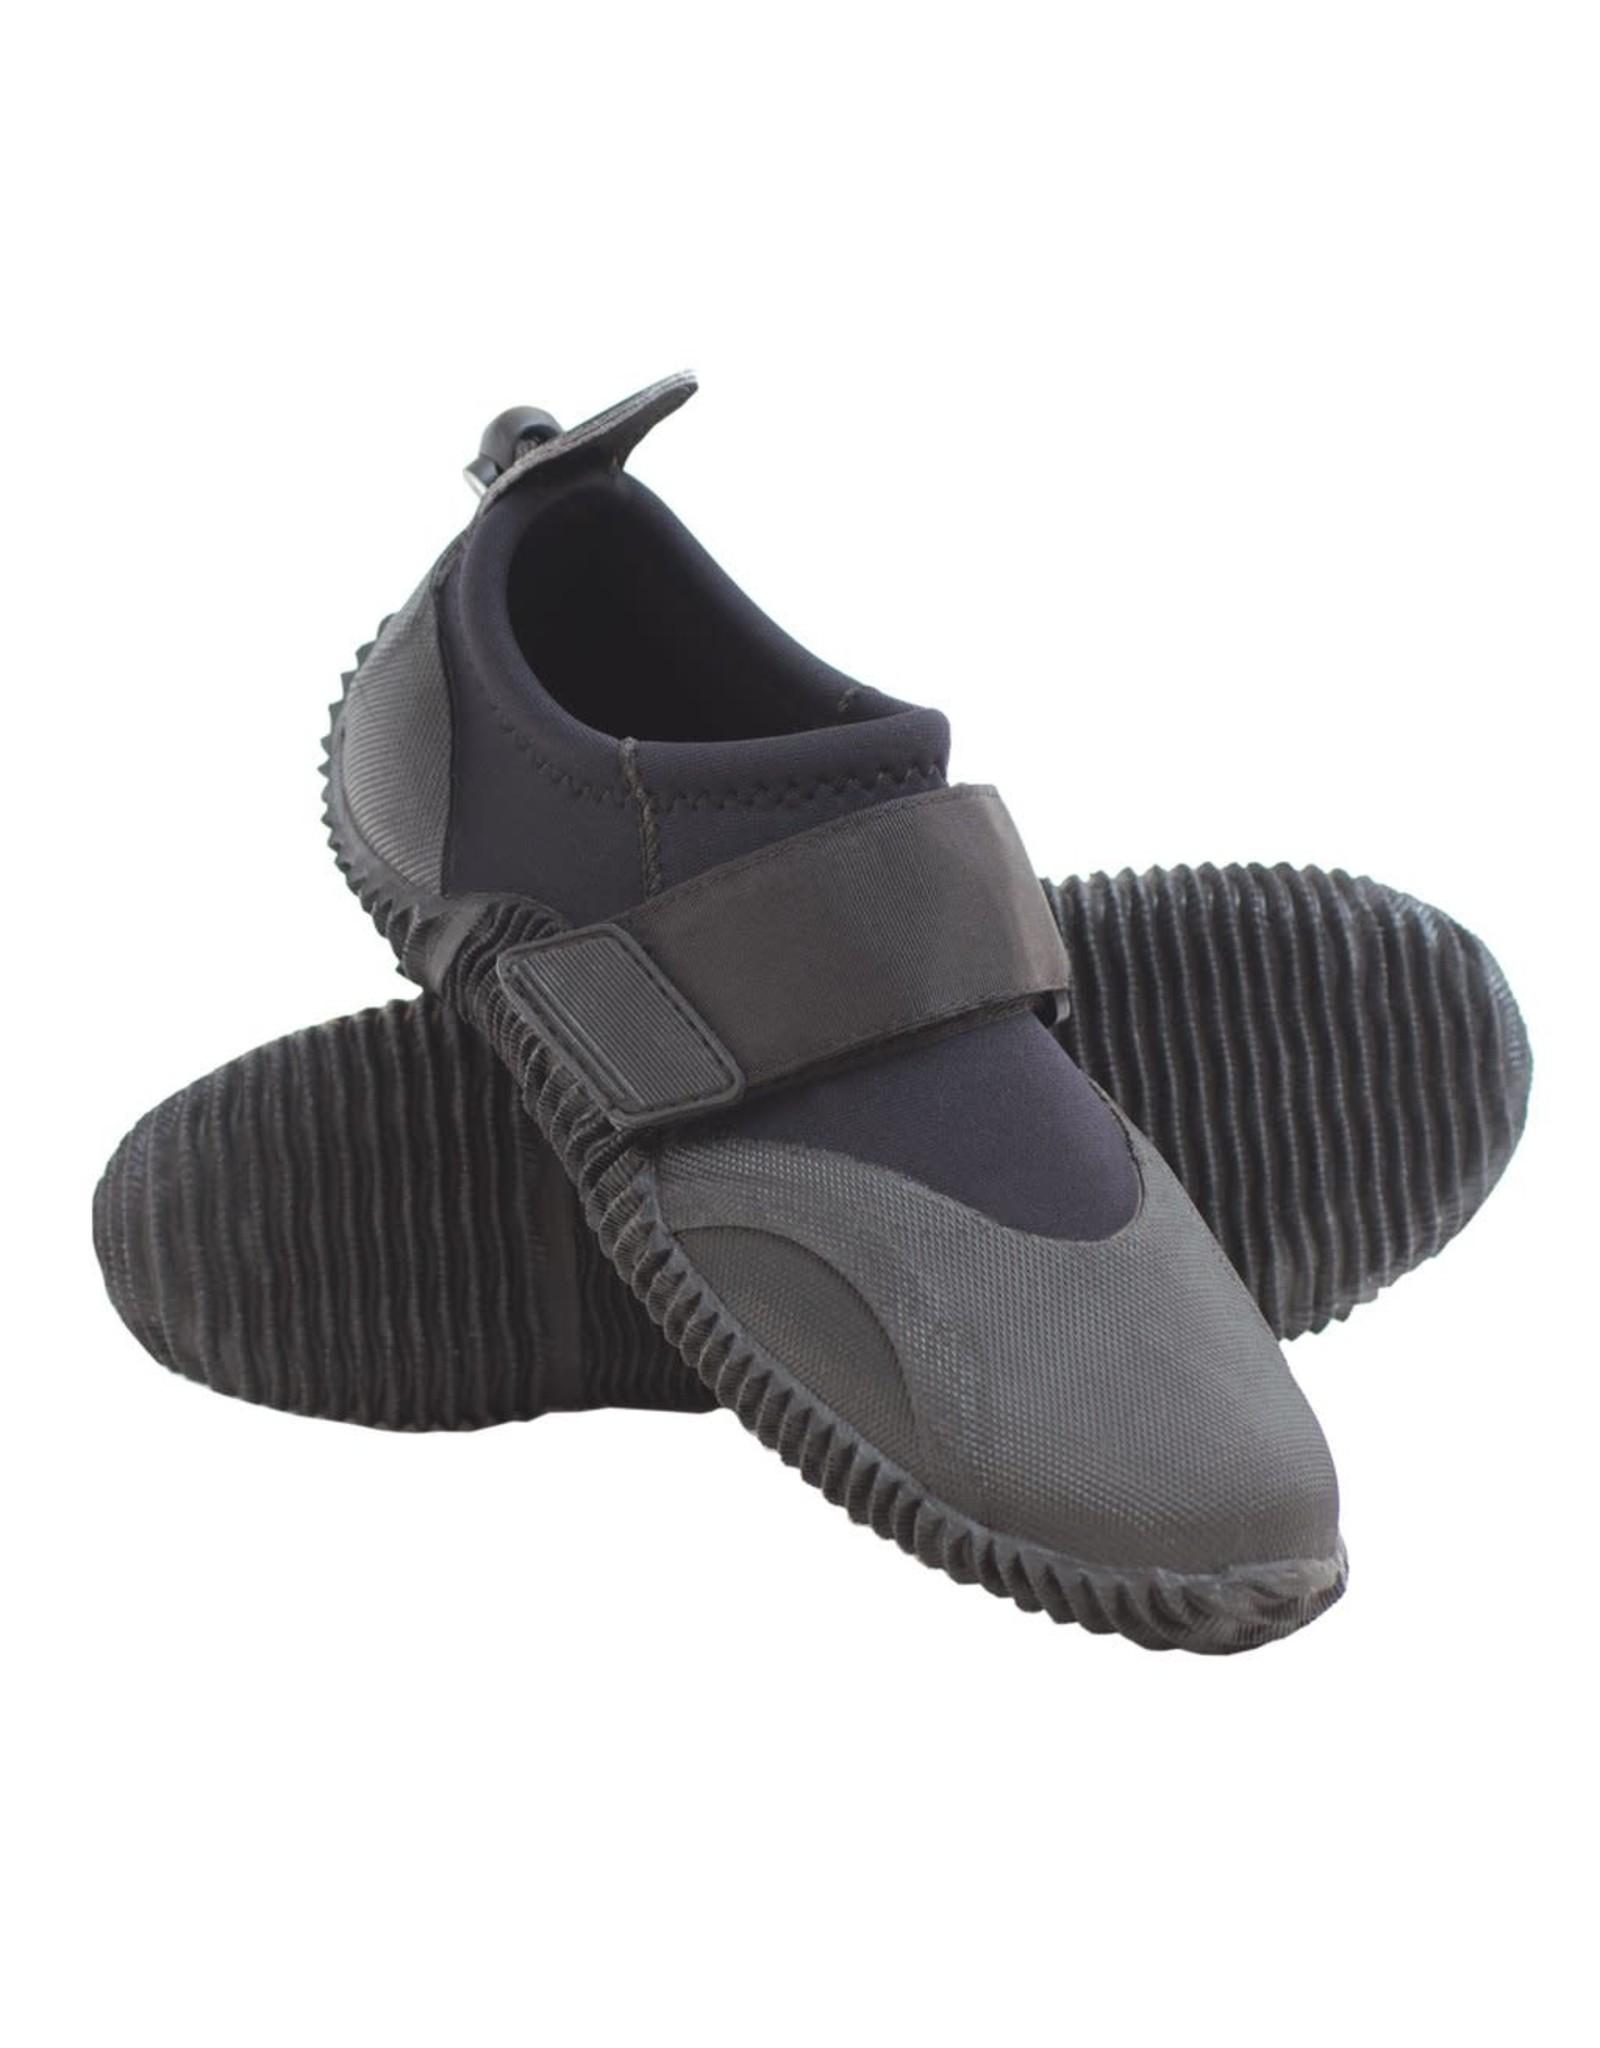 Atlan Atlan luxury water shoe 5